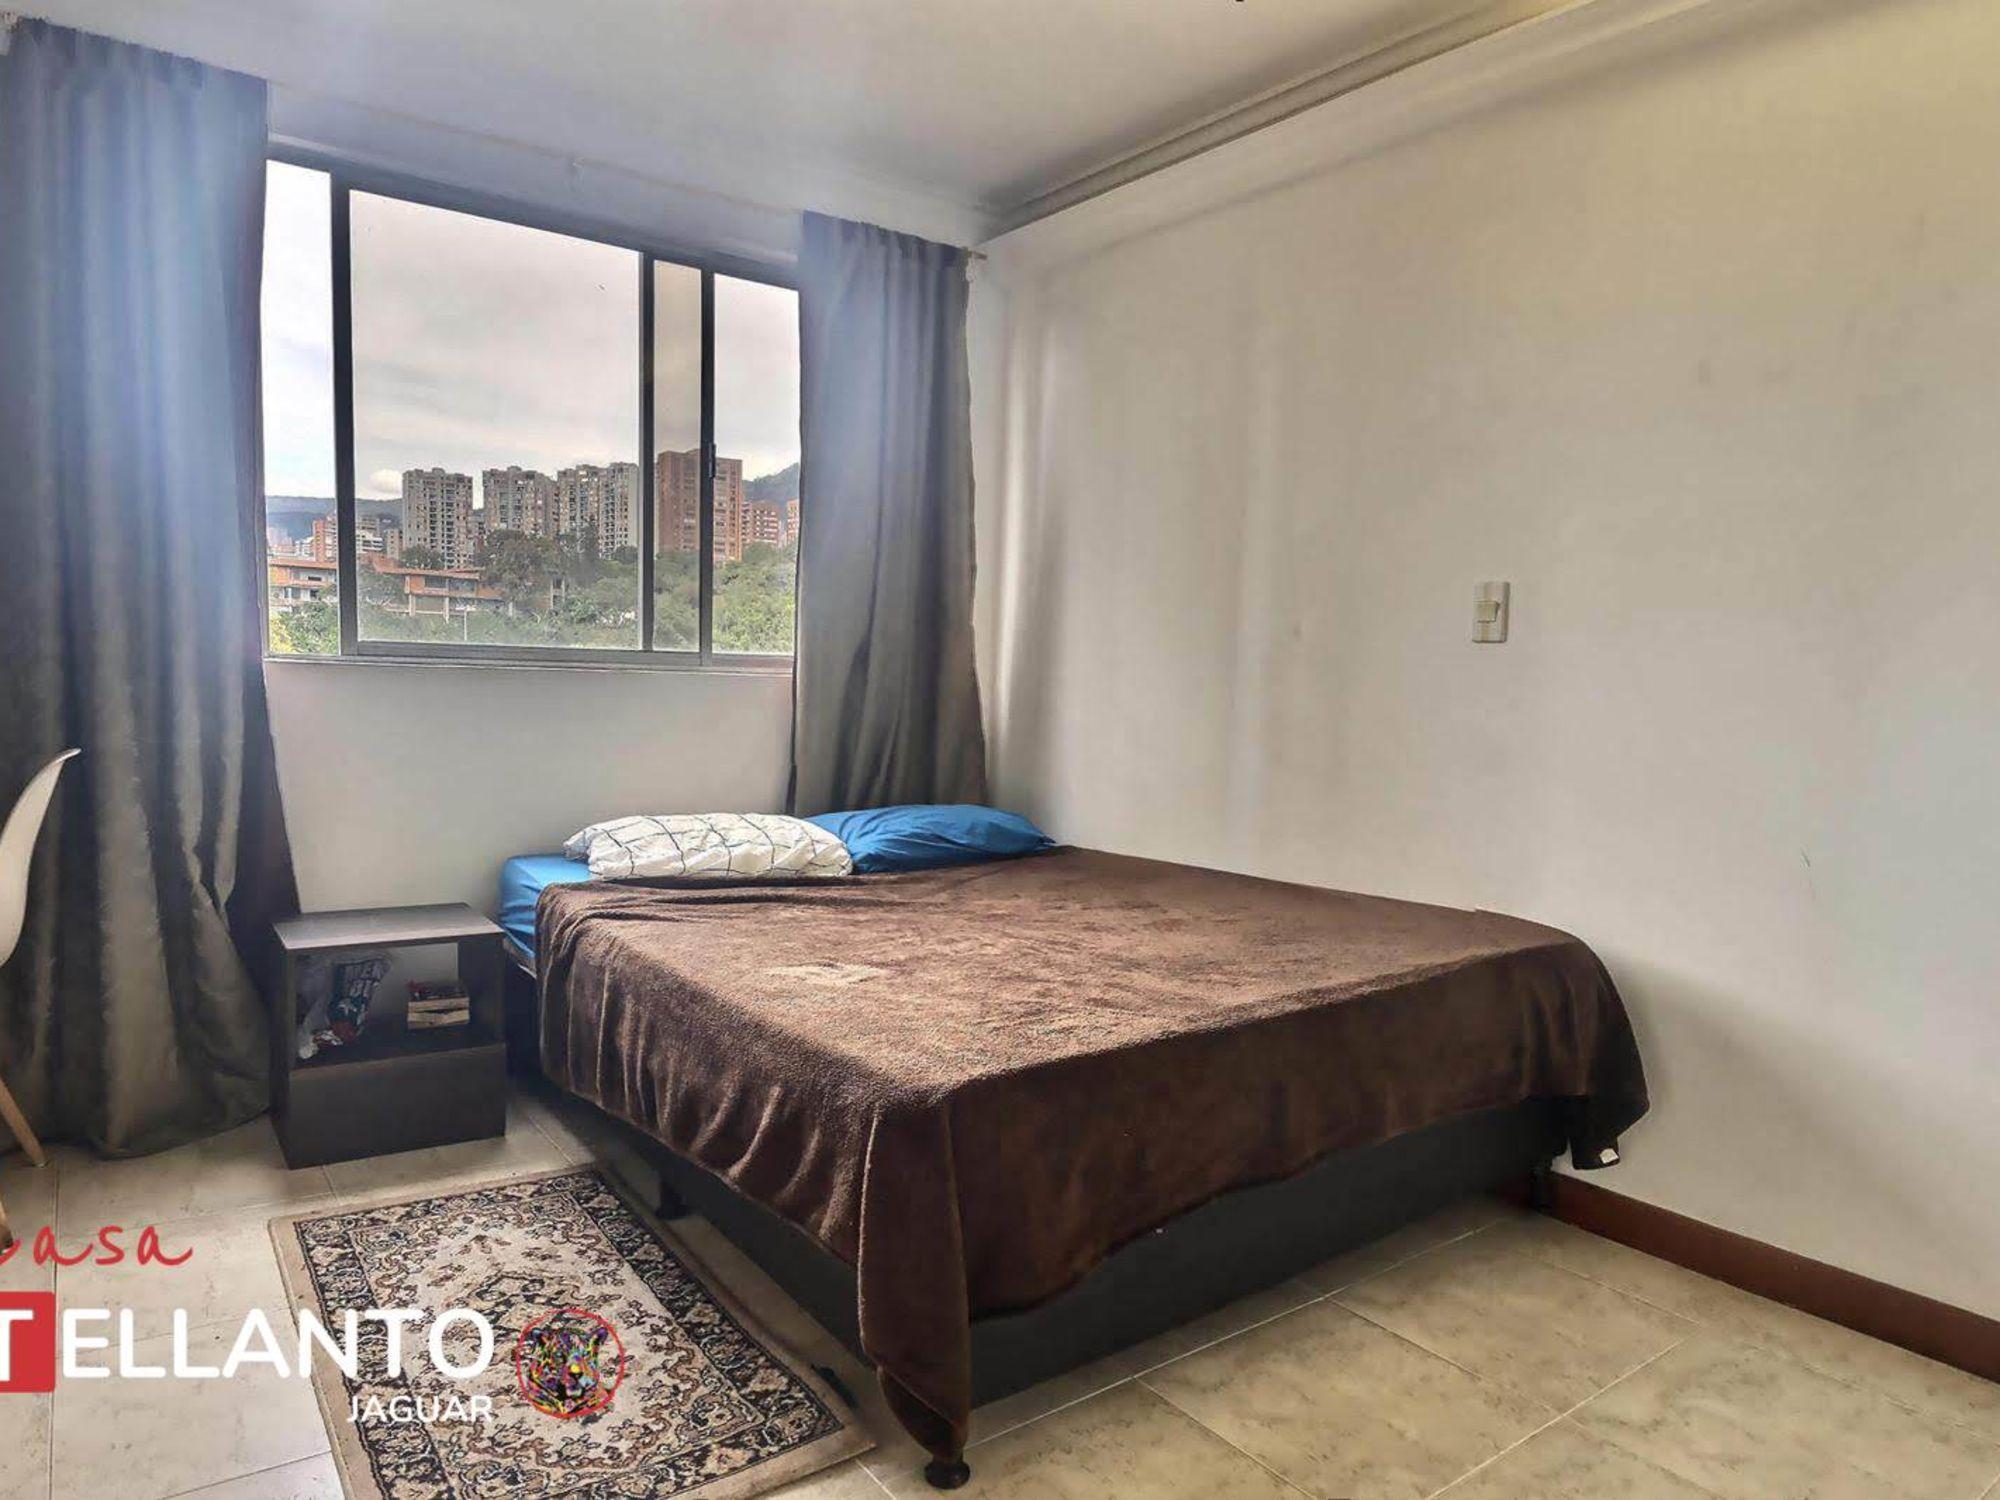 Property rentals in Medellin